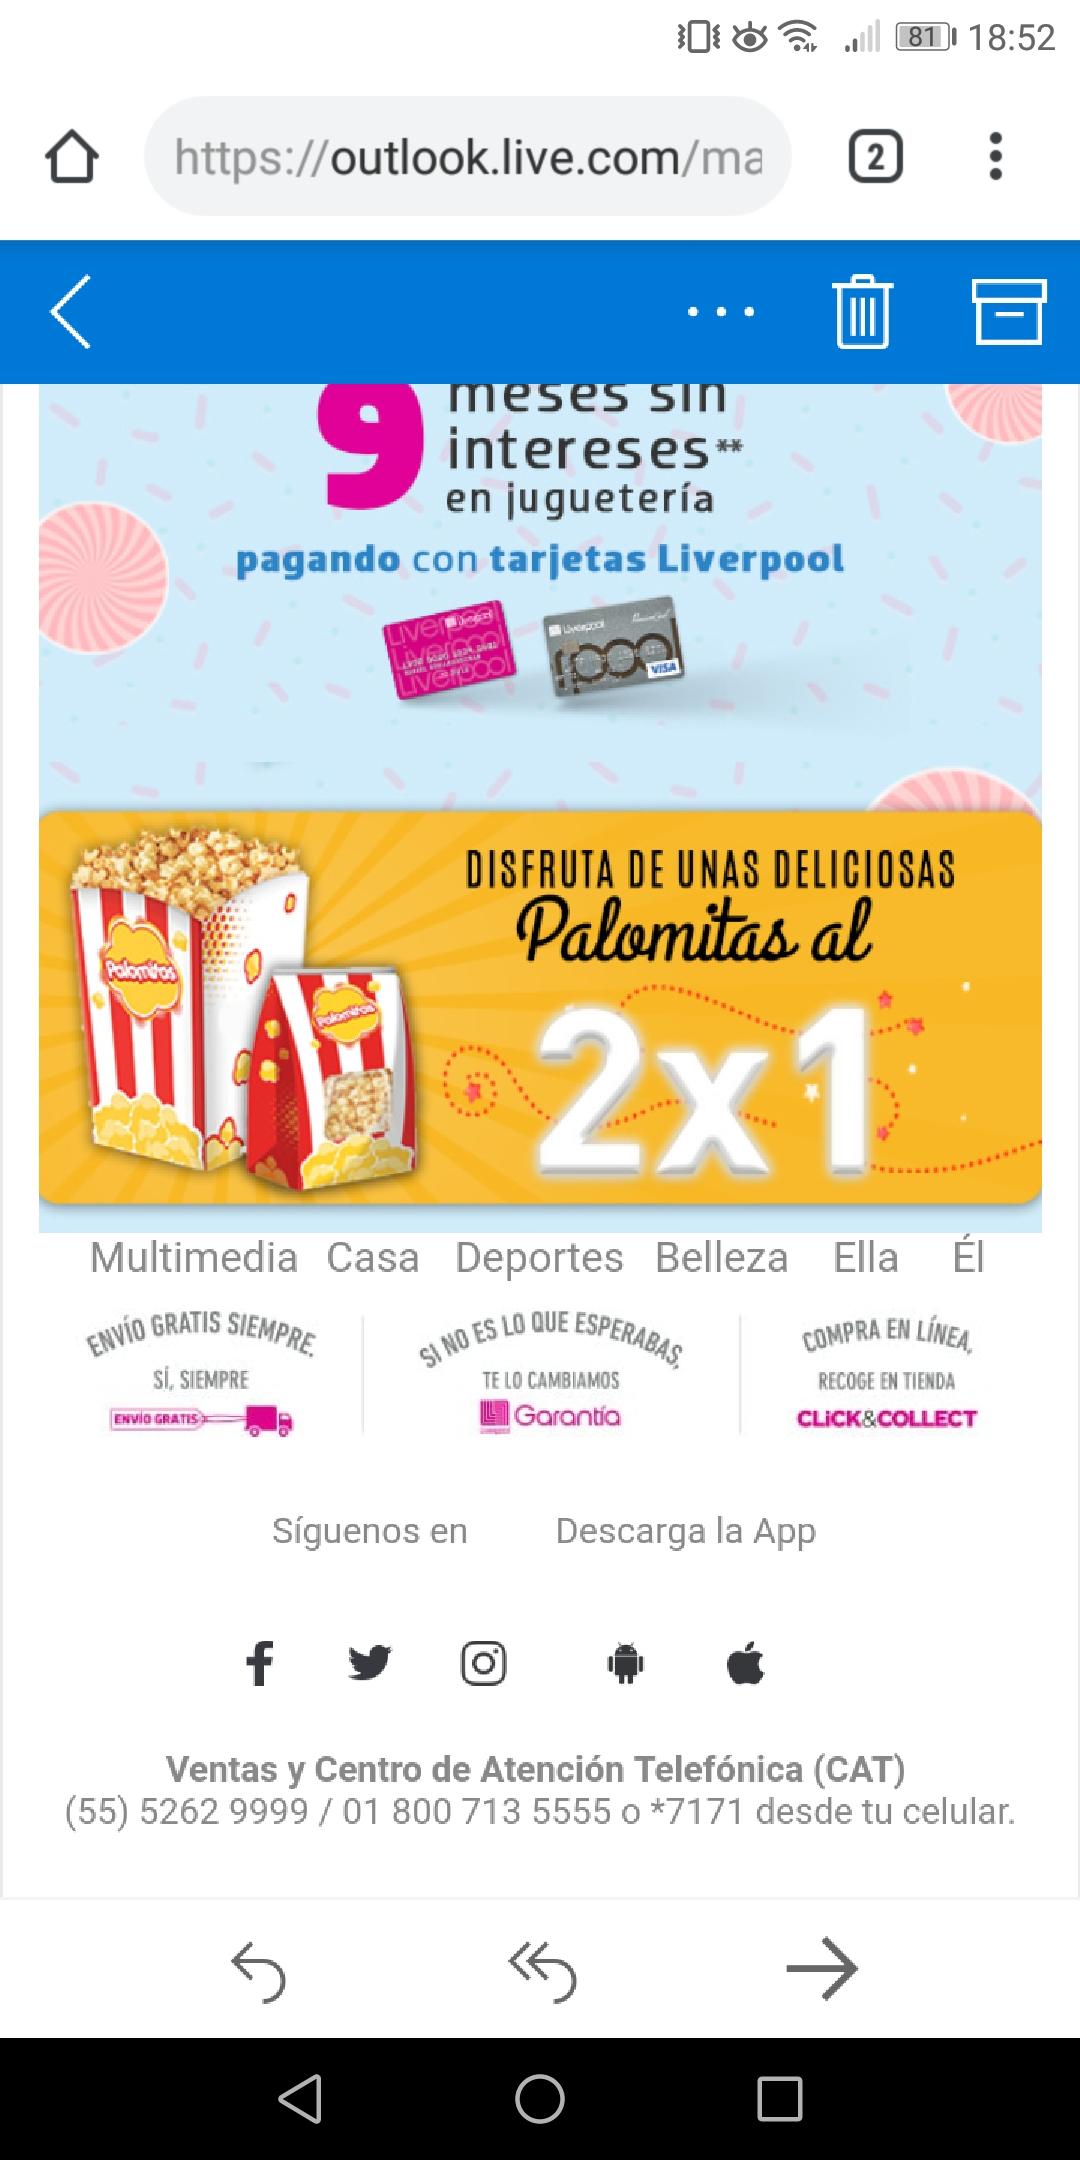 Liverpool: Palomitas al 2x1